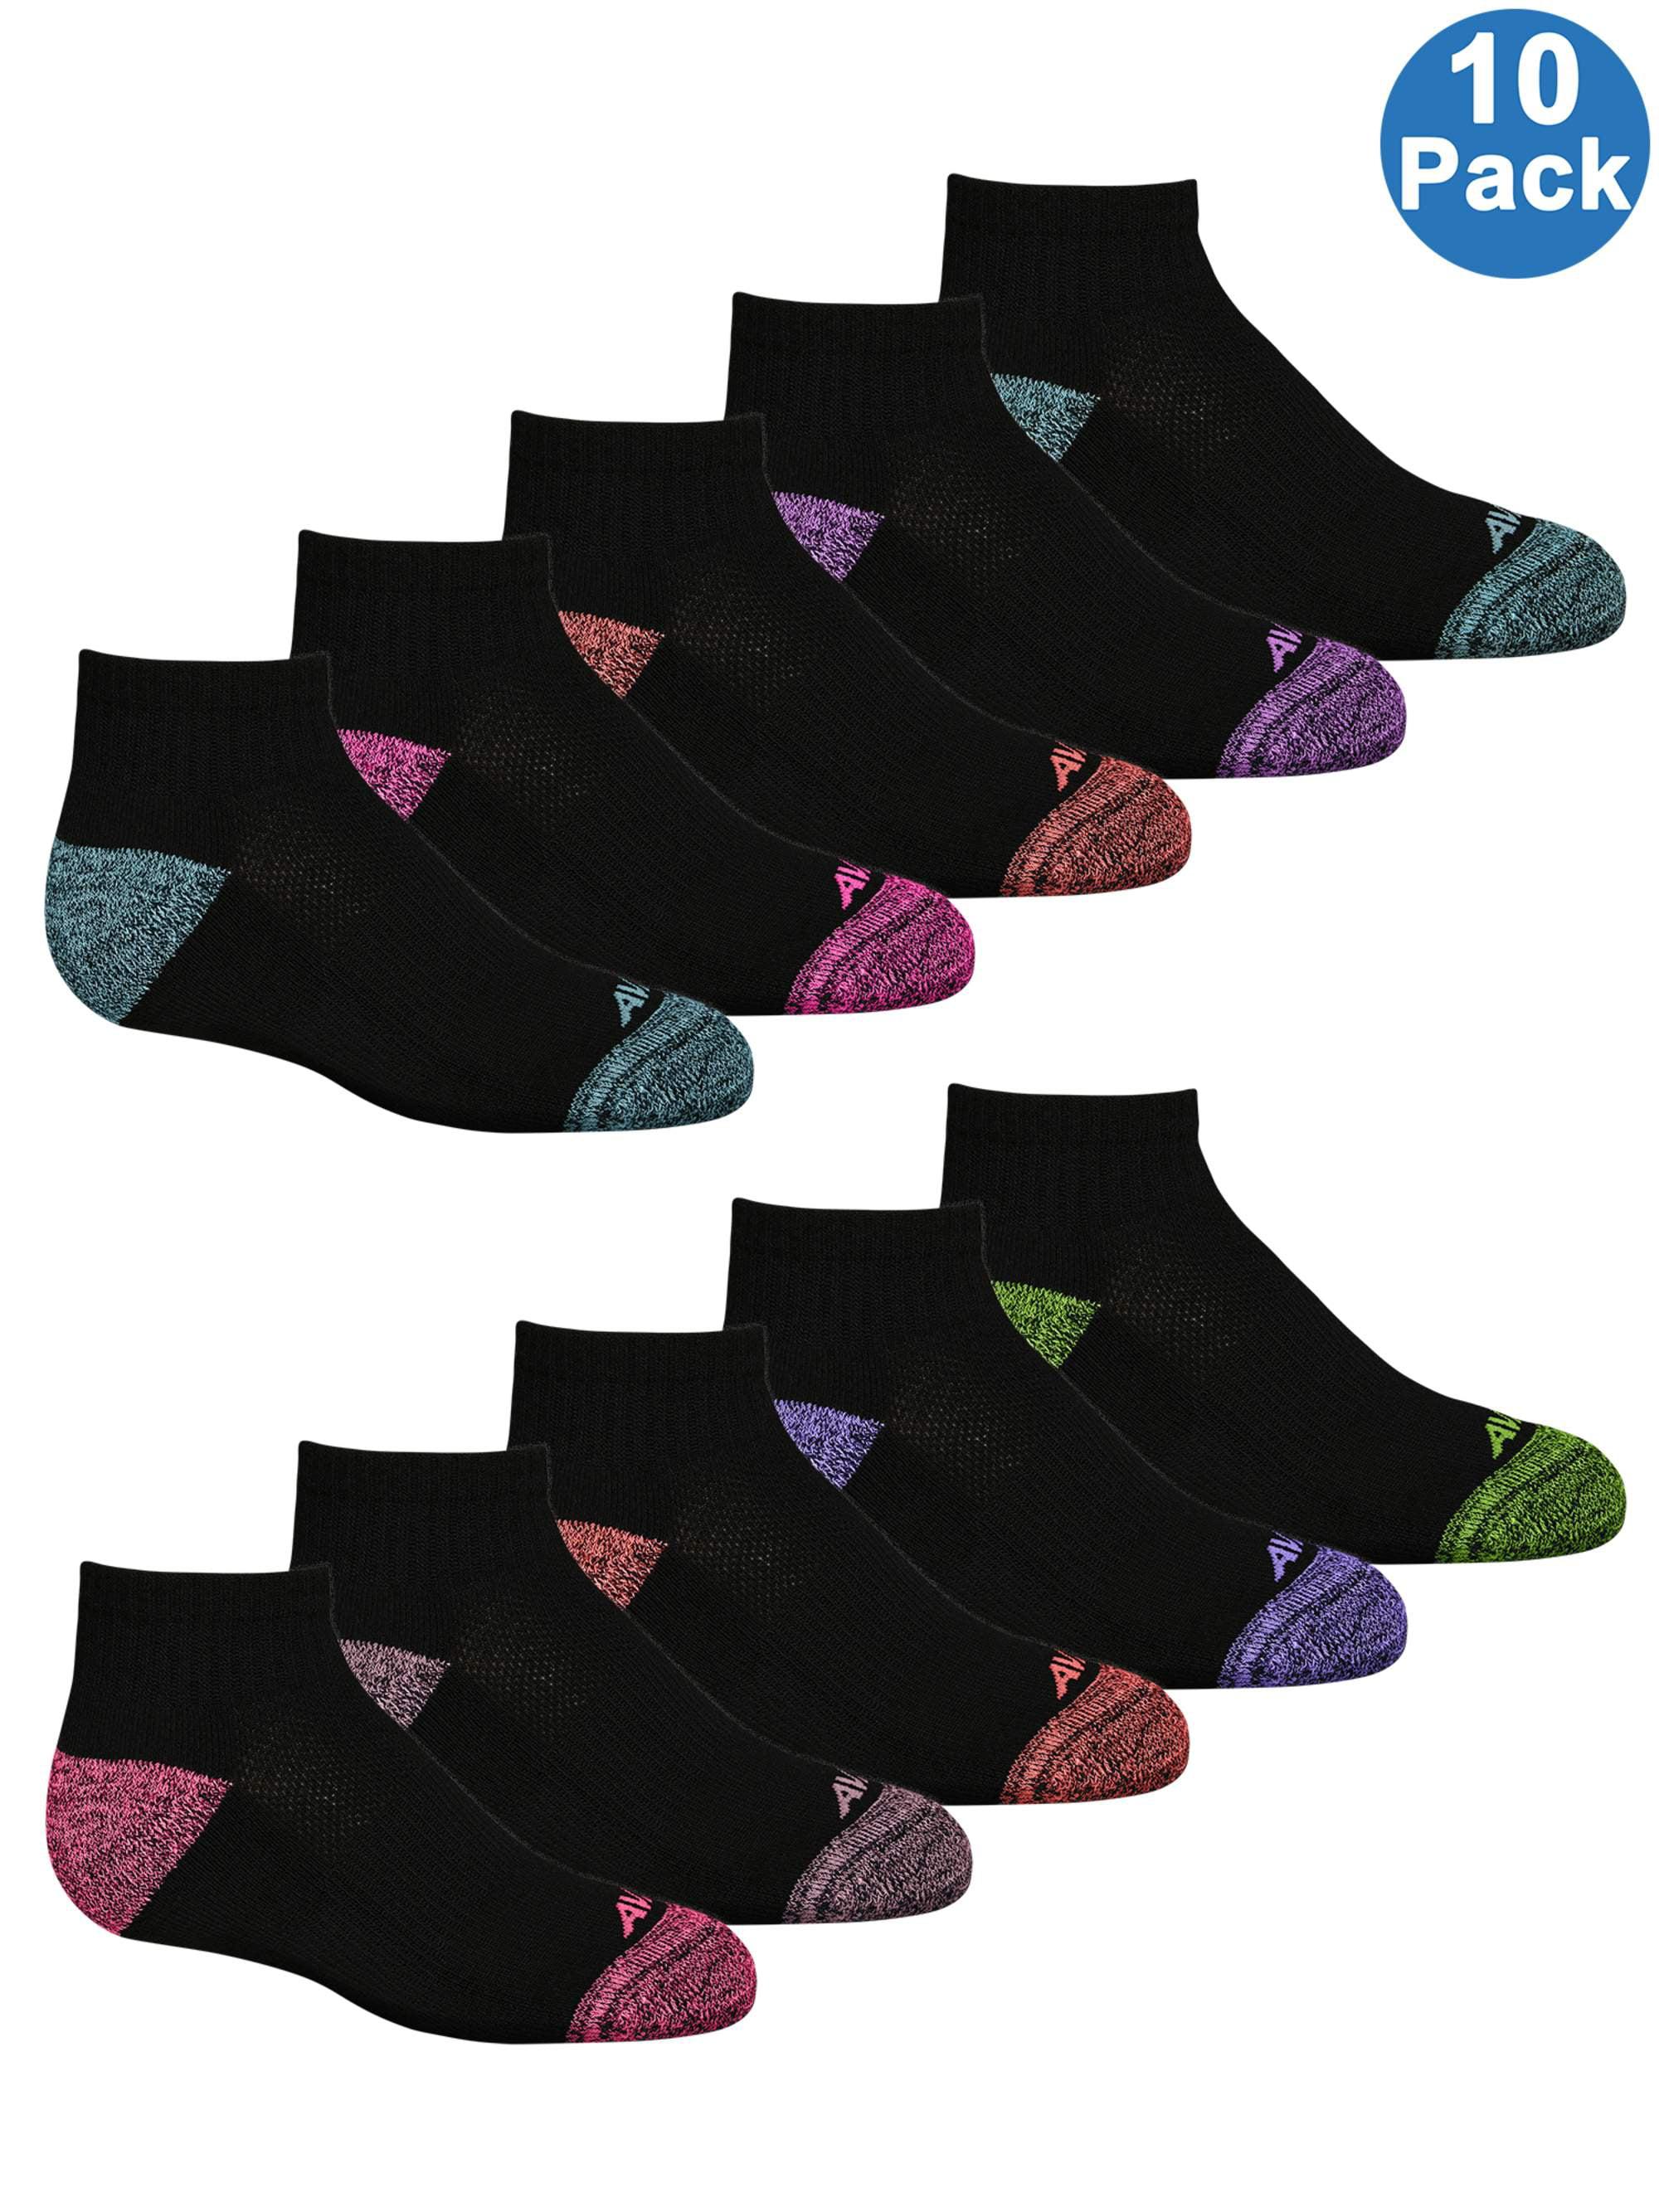 Avia Girls High Performance Low Cut Socks with Cushion Comfort 10 Pack